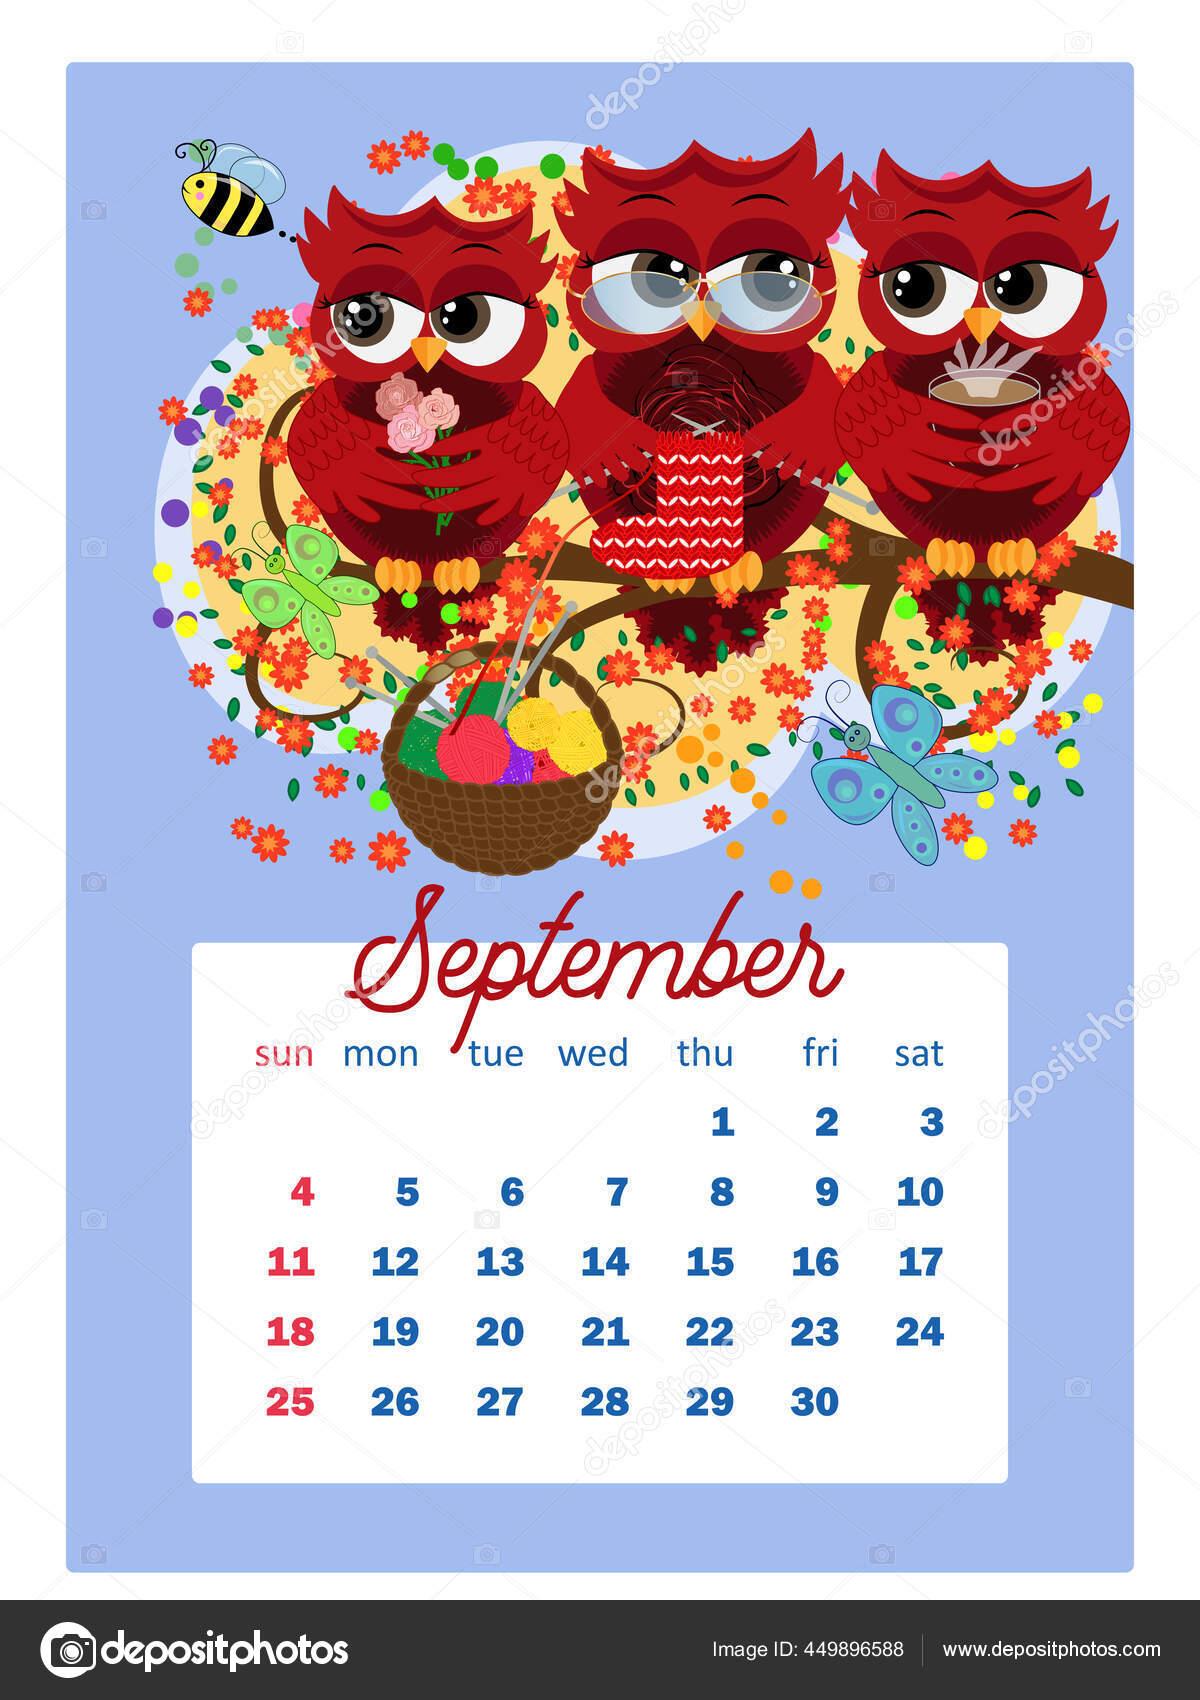 Ou Calendar 2022.Calendar 2022 Cute Owls Birds Every Month Wall Vertical Calendar Vector Image By C Michiru13 Vector Stock 449896588